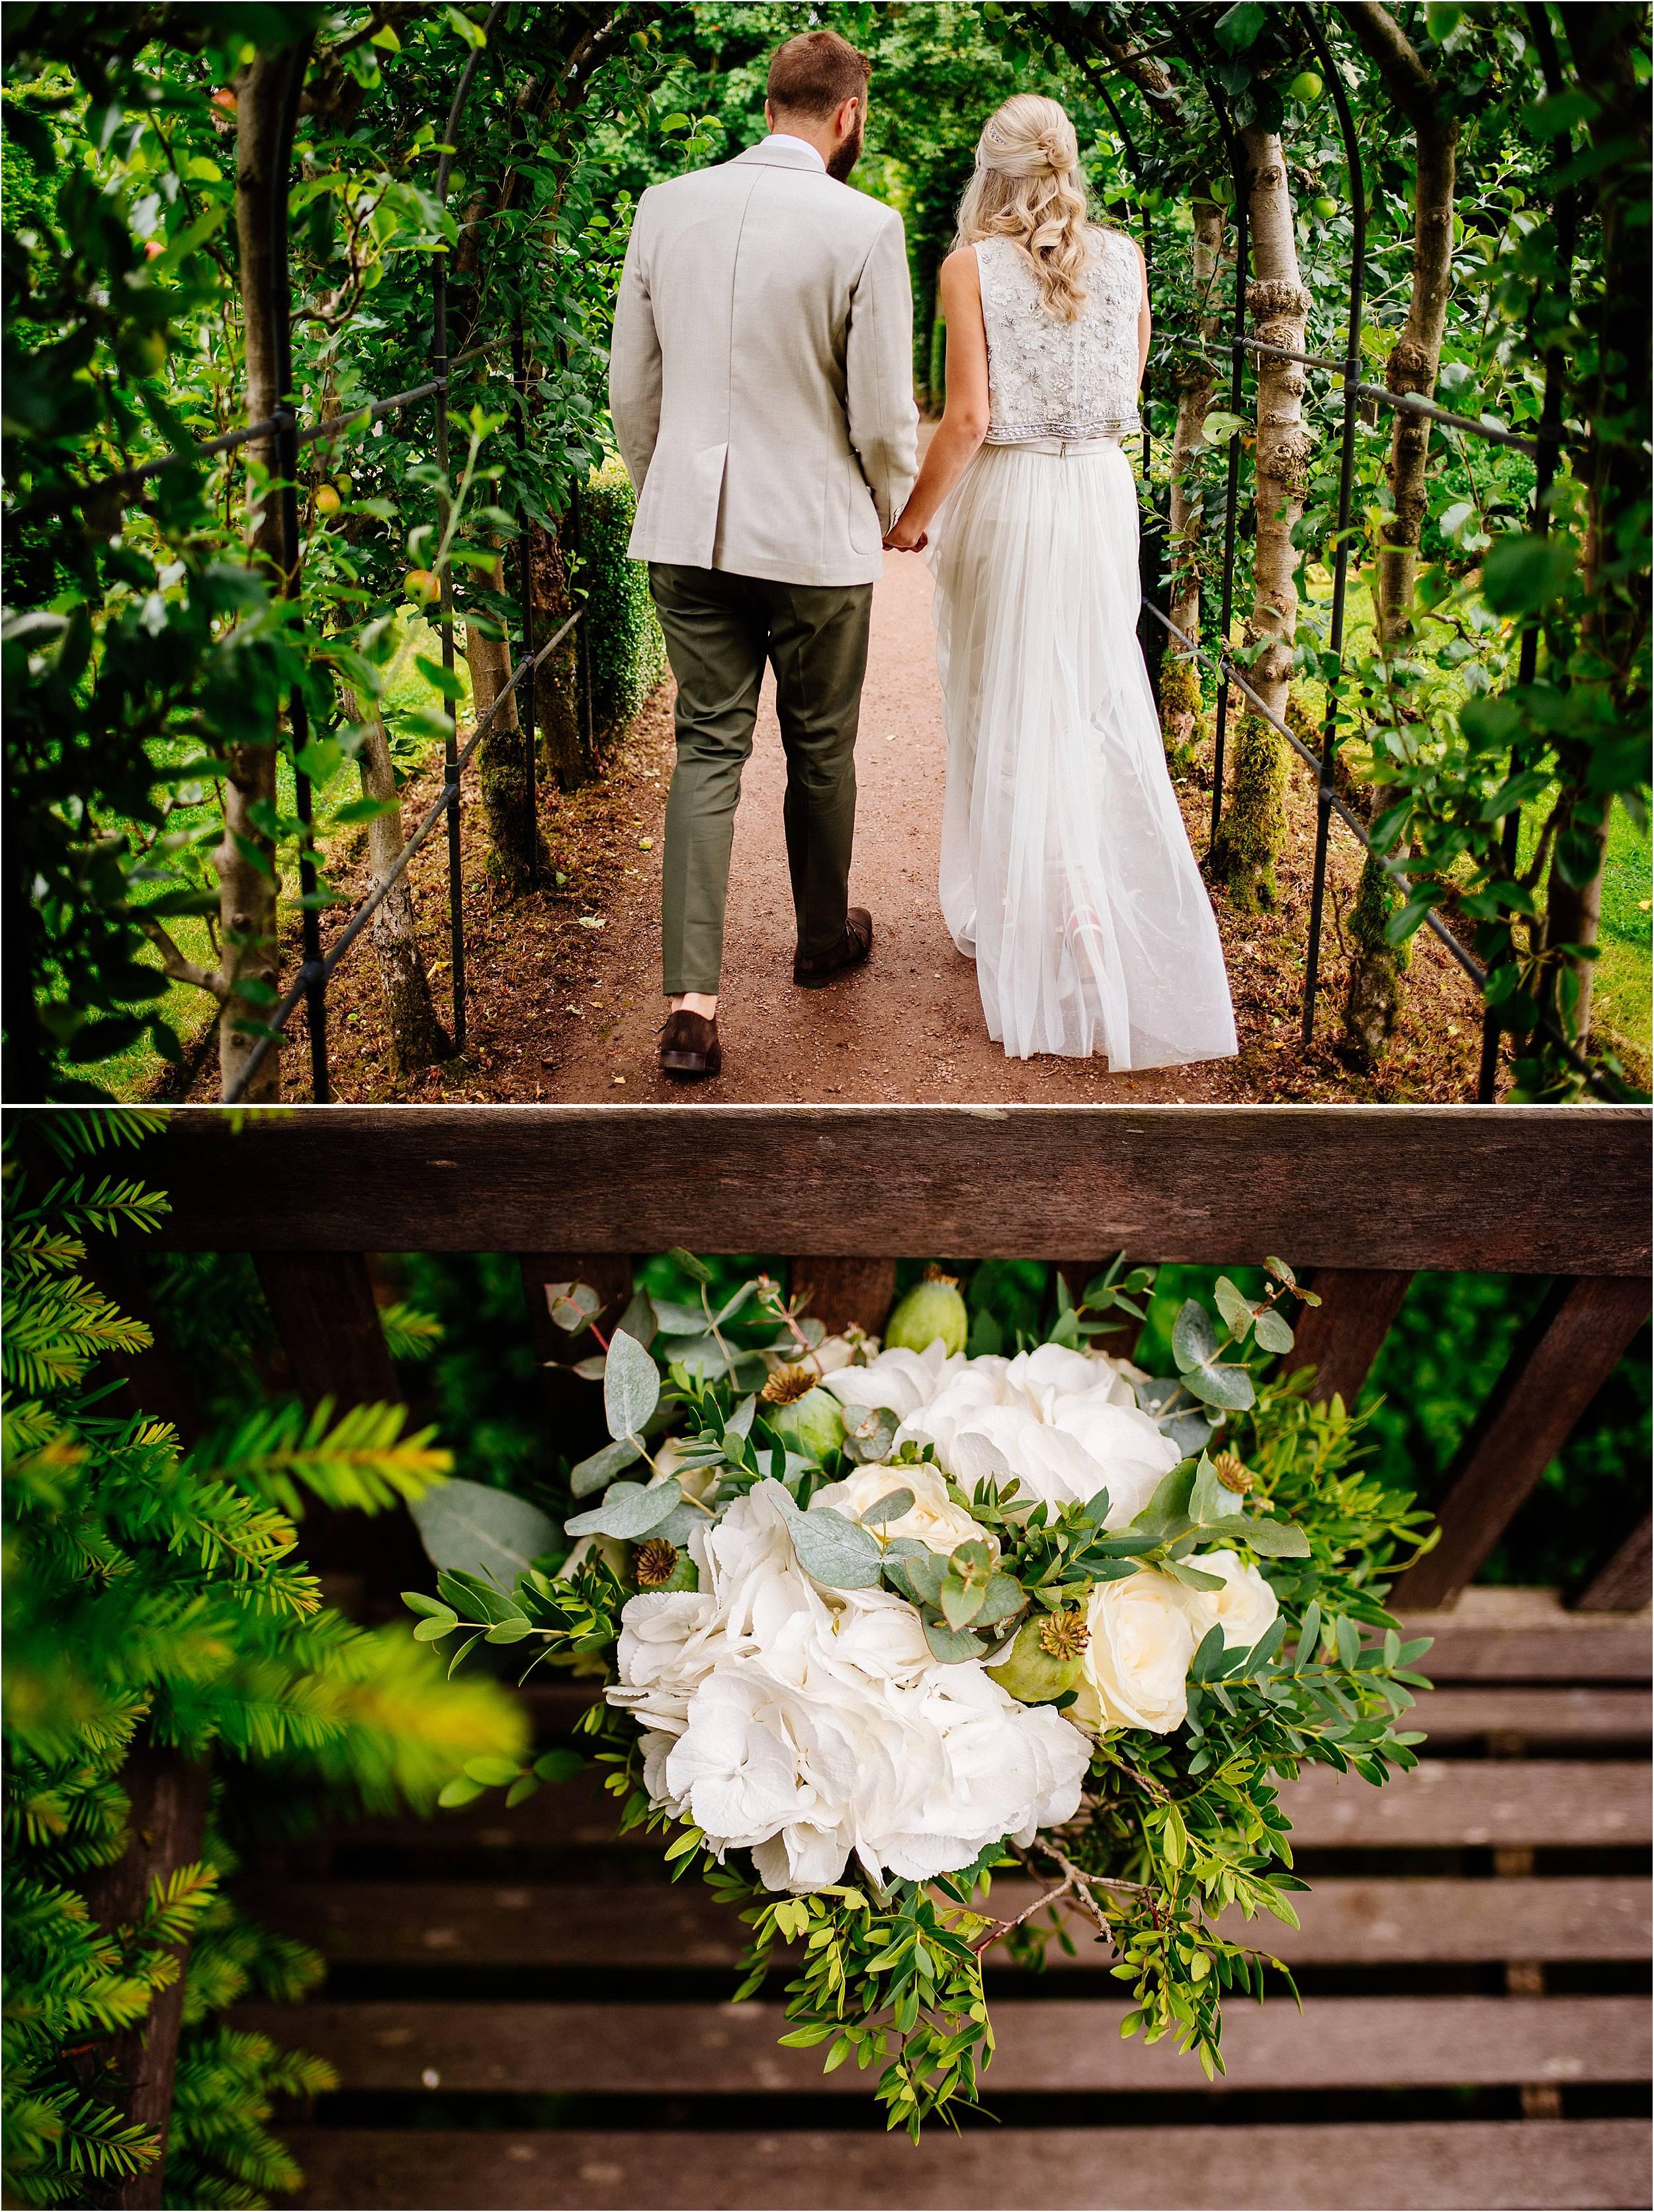 Barnsdale Gardens Wedding Photographer_0078.jpg